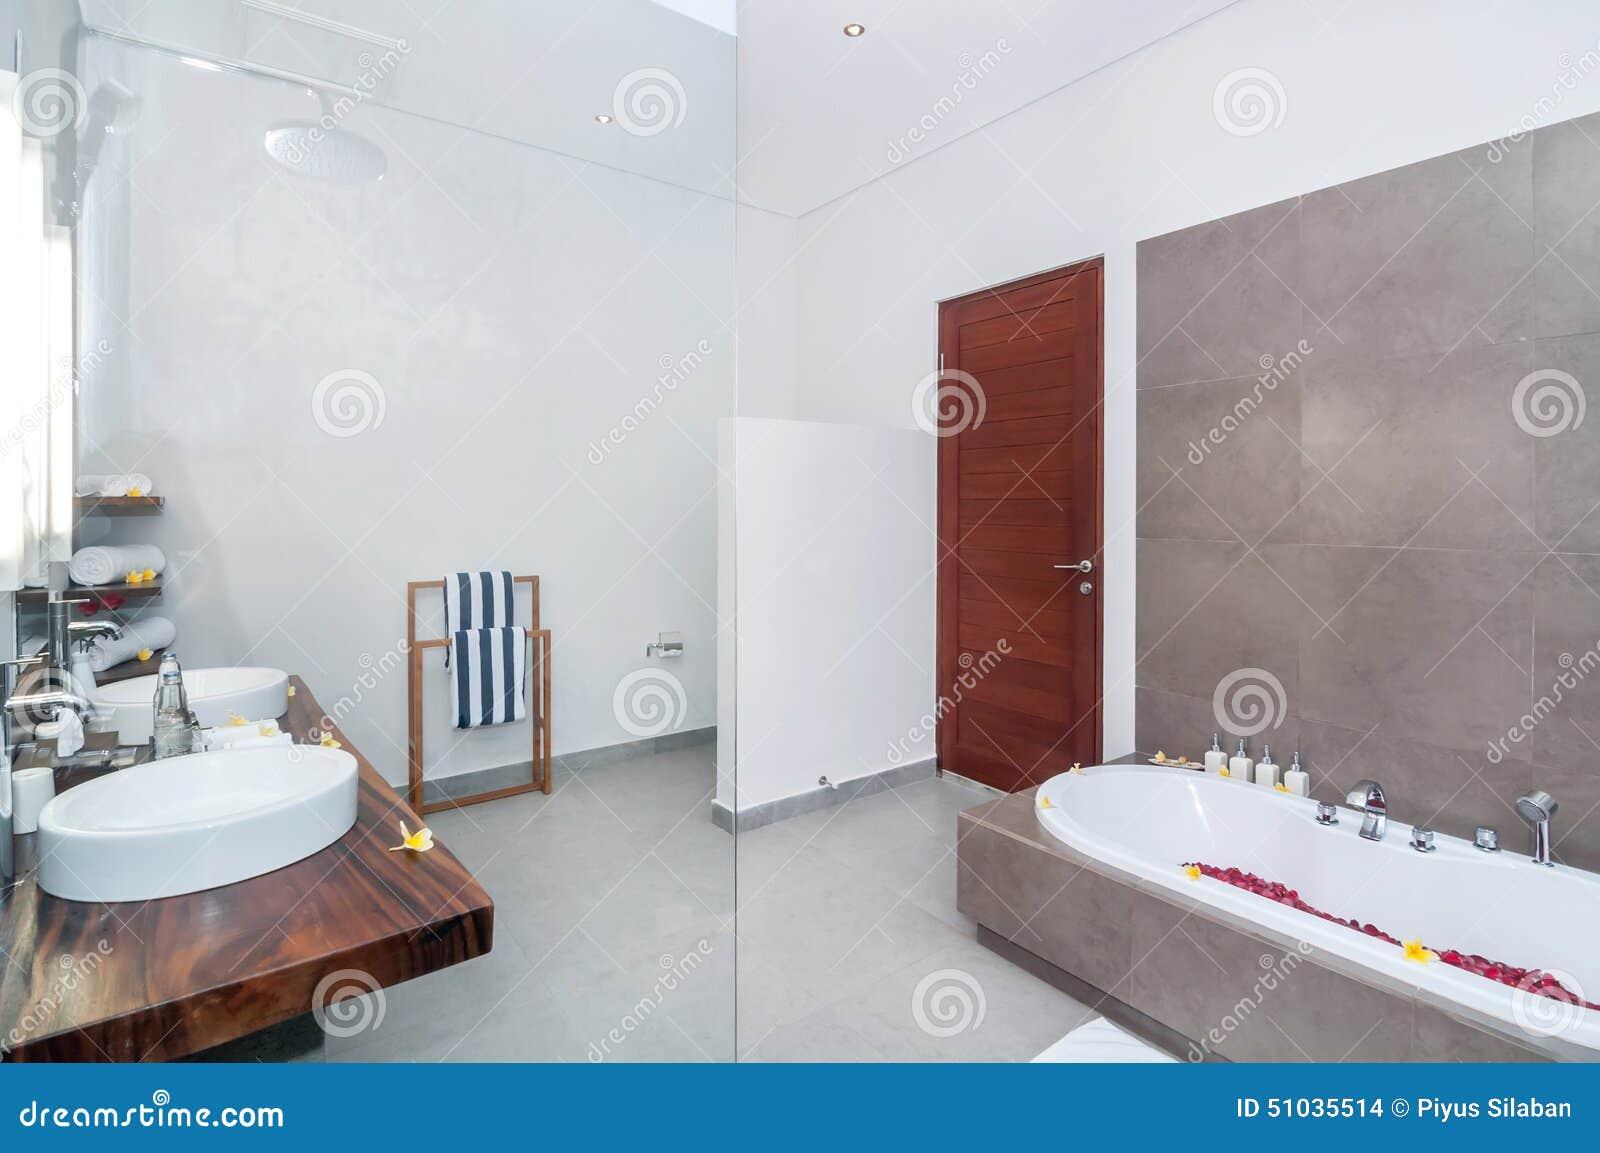 Lyx och rent badrum arkivfoto   bild: 51036738